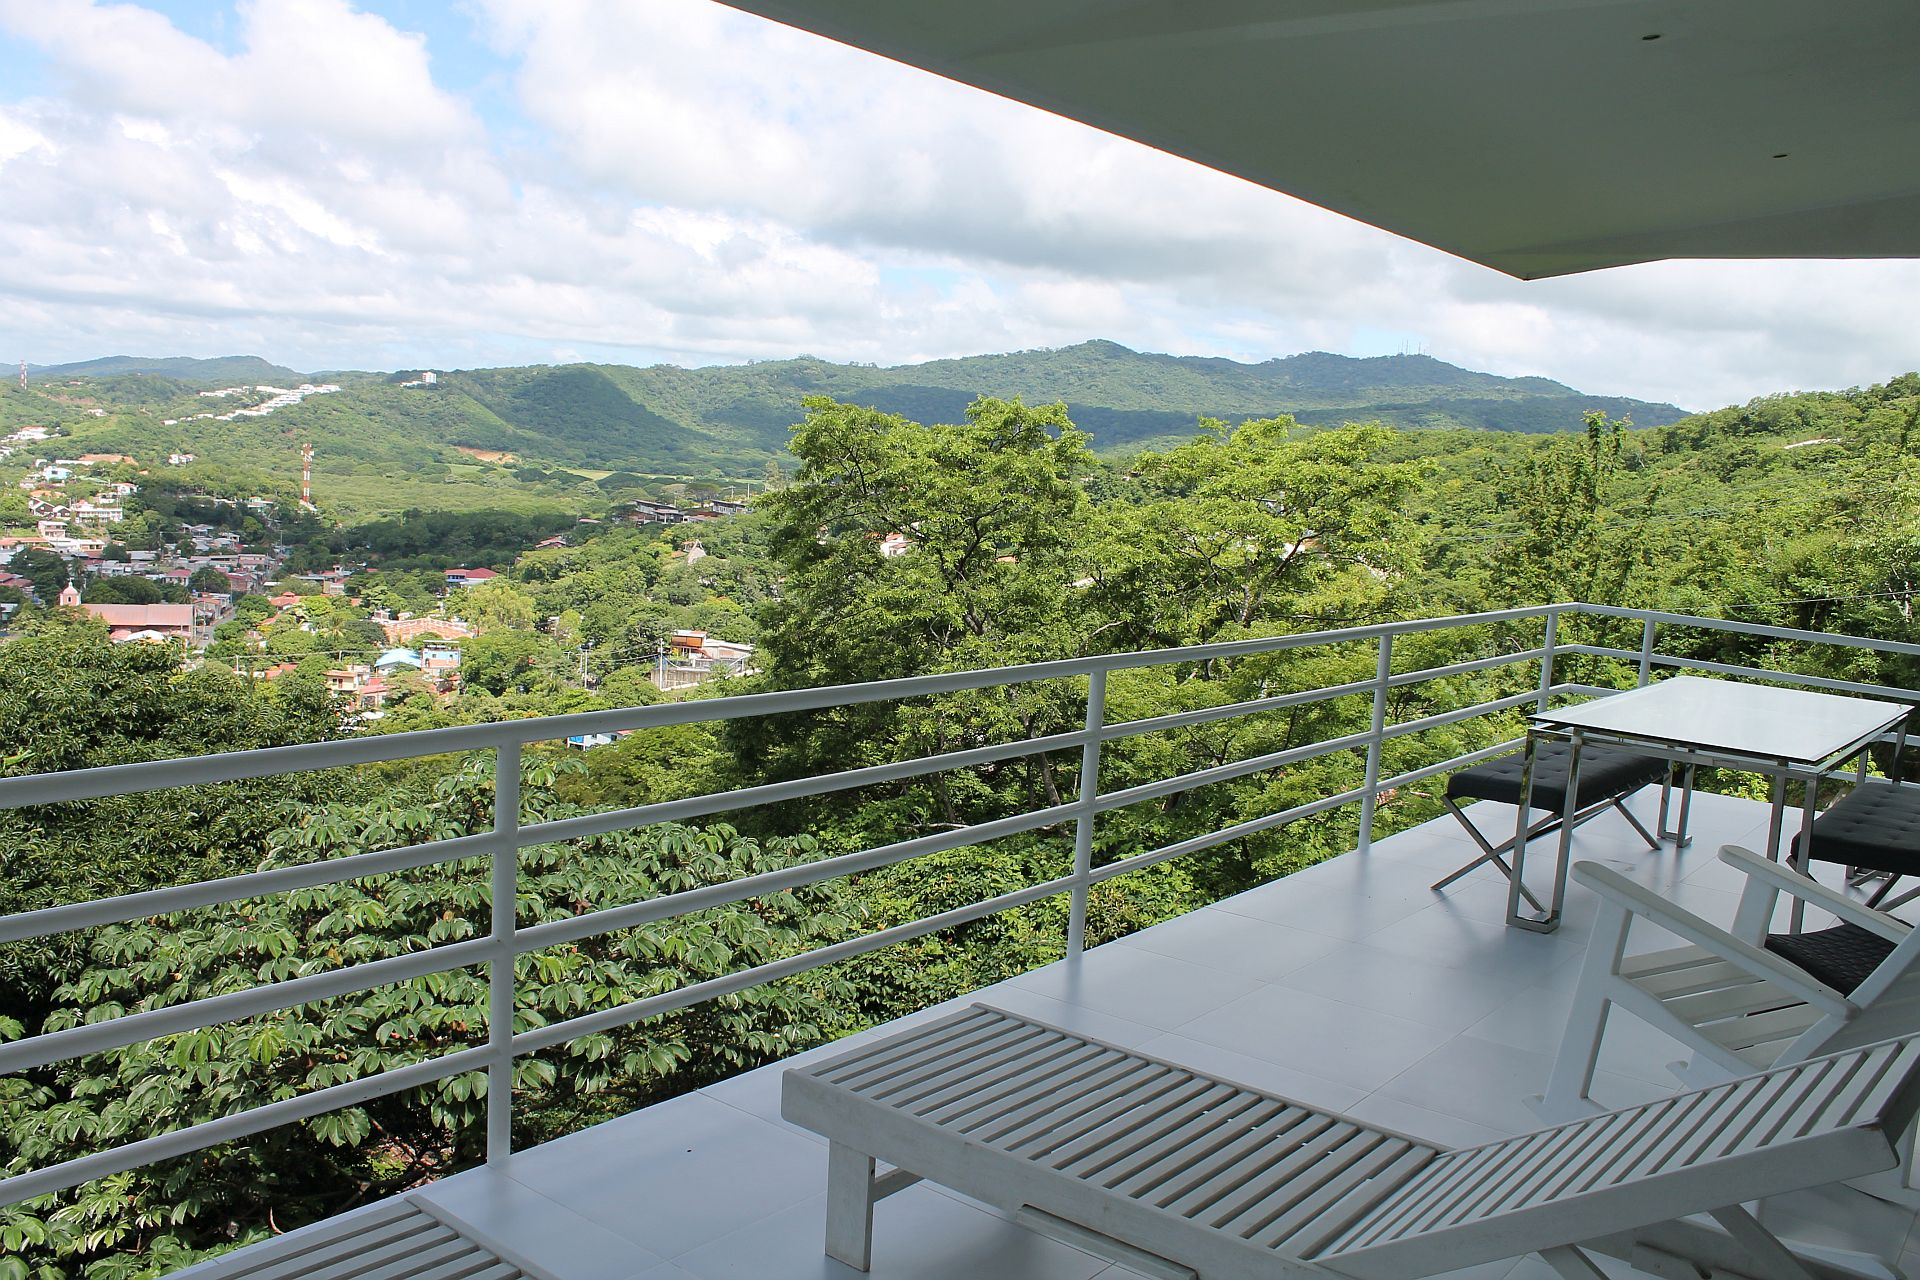 Balcony3-02.jpg